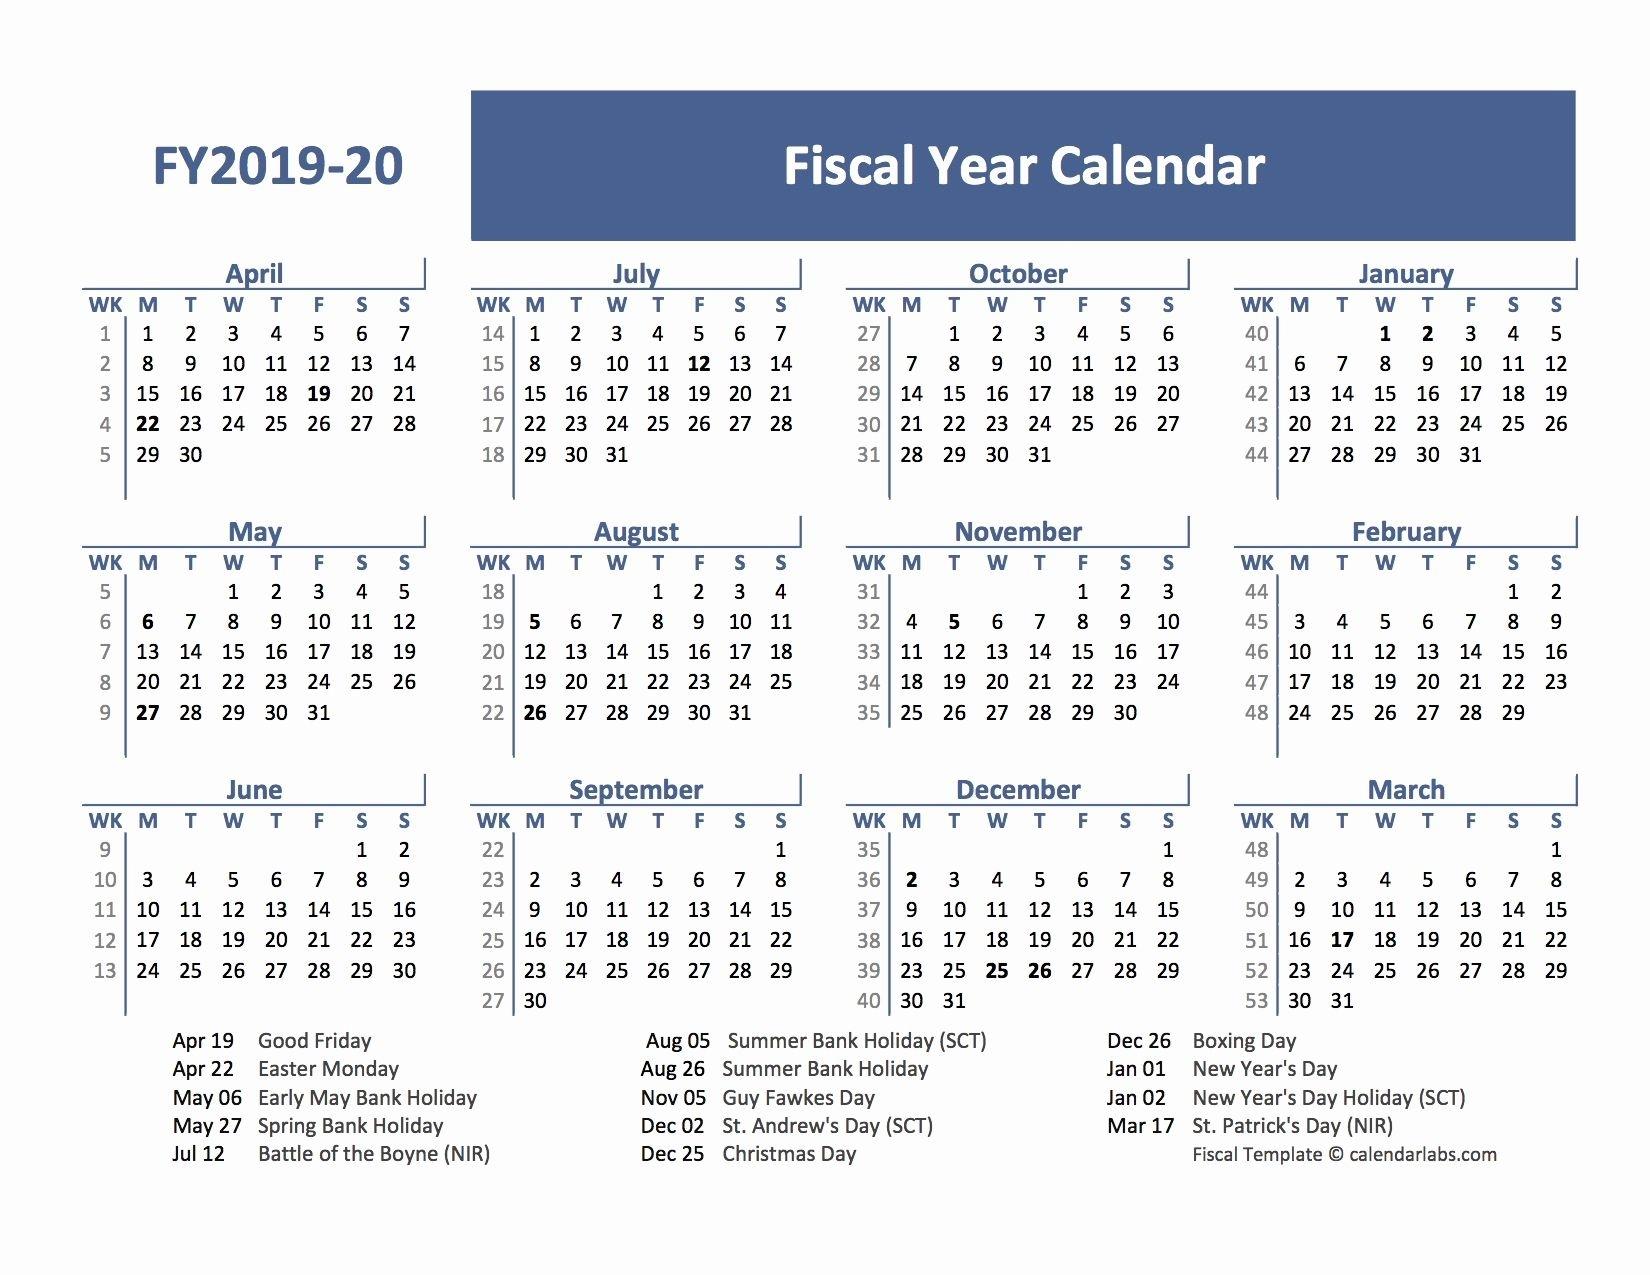 Pin On Calendar Printable 2019-2020 throughout Financial Calendar 2019-2020 In Weeks